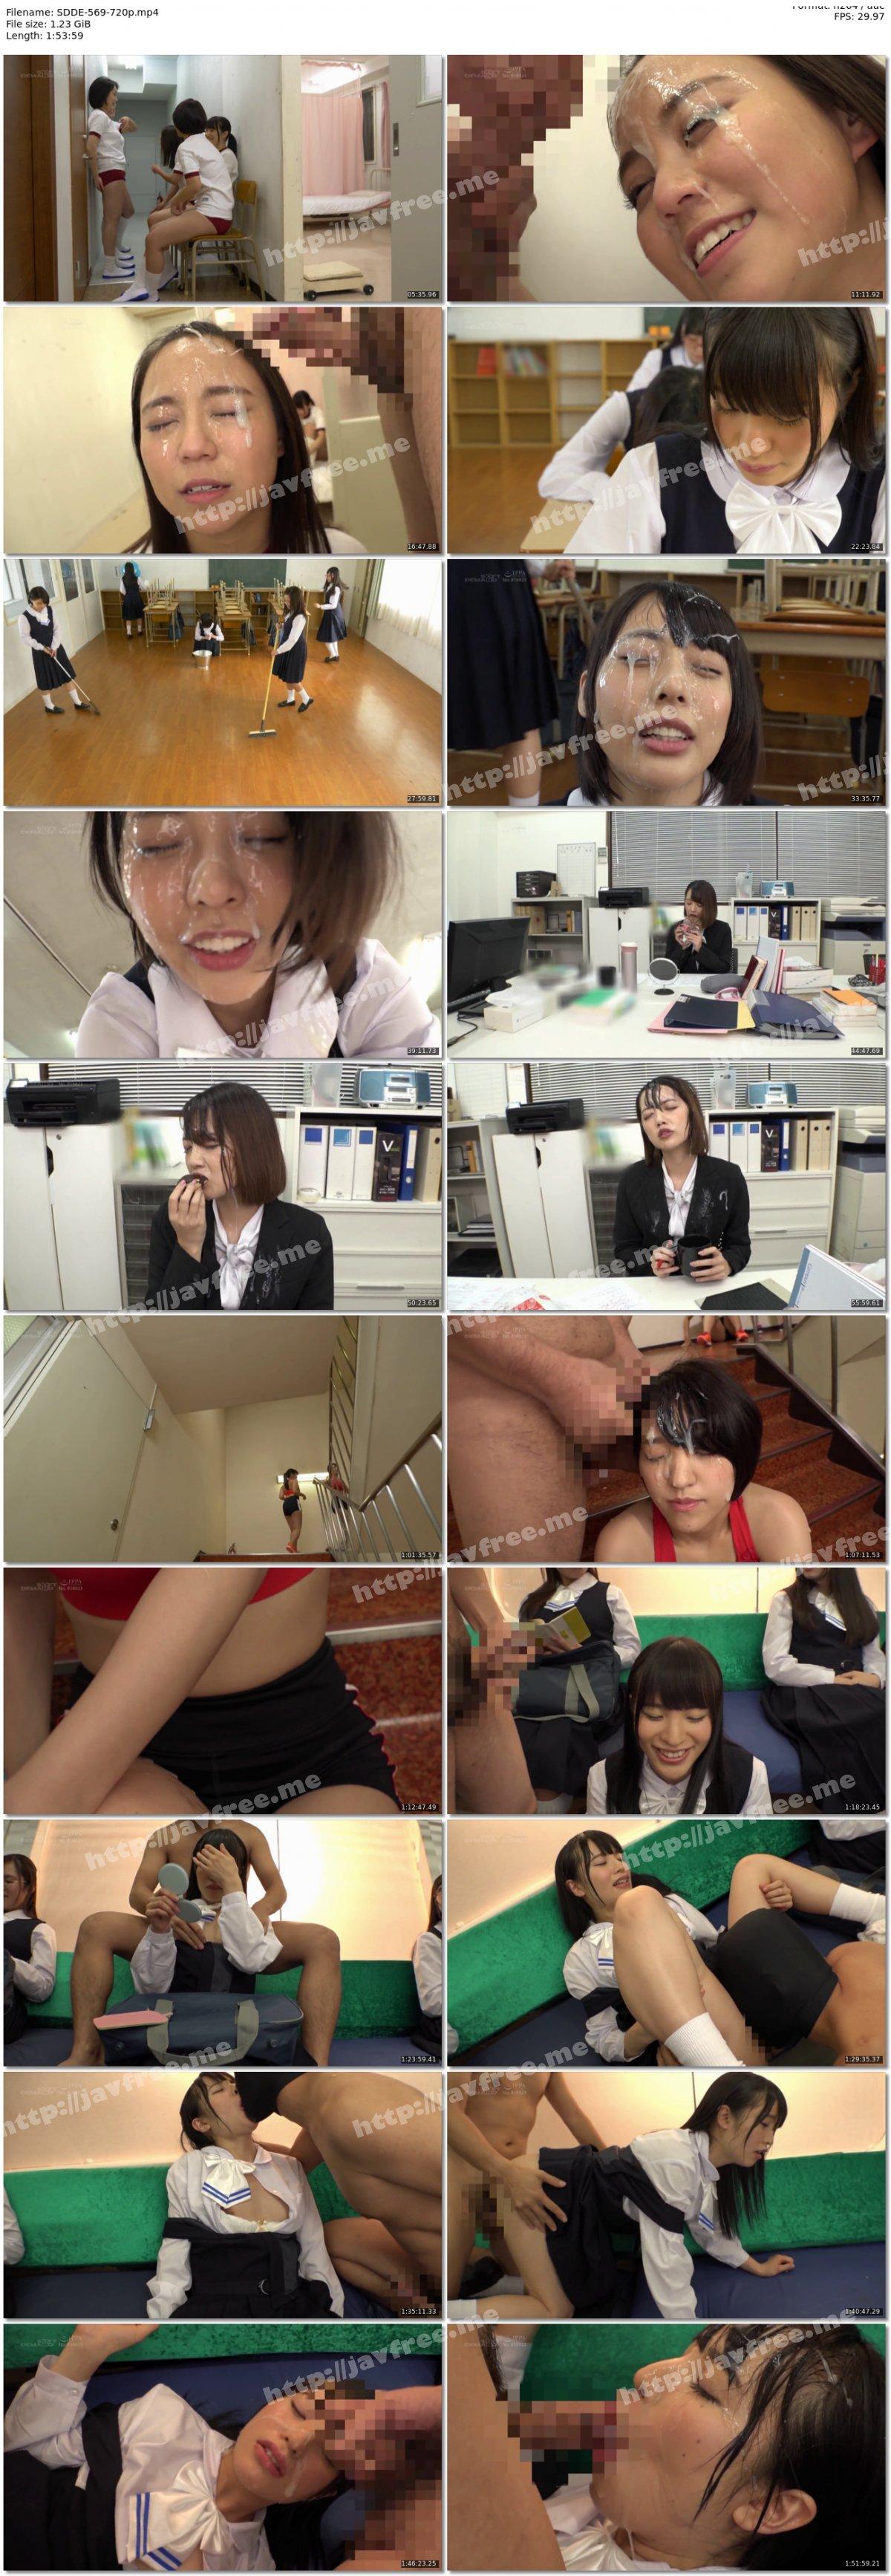 [HD][SDDE-569] 突然、どろっどろ精子が降り注がれる日常 学園生活で「常にぶっかけ」女子○生2 - image SDDE-569-720p on https://javfree.me